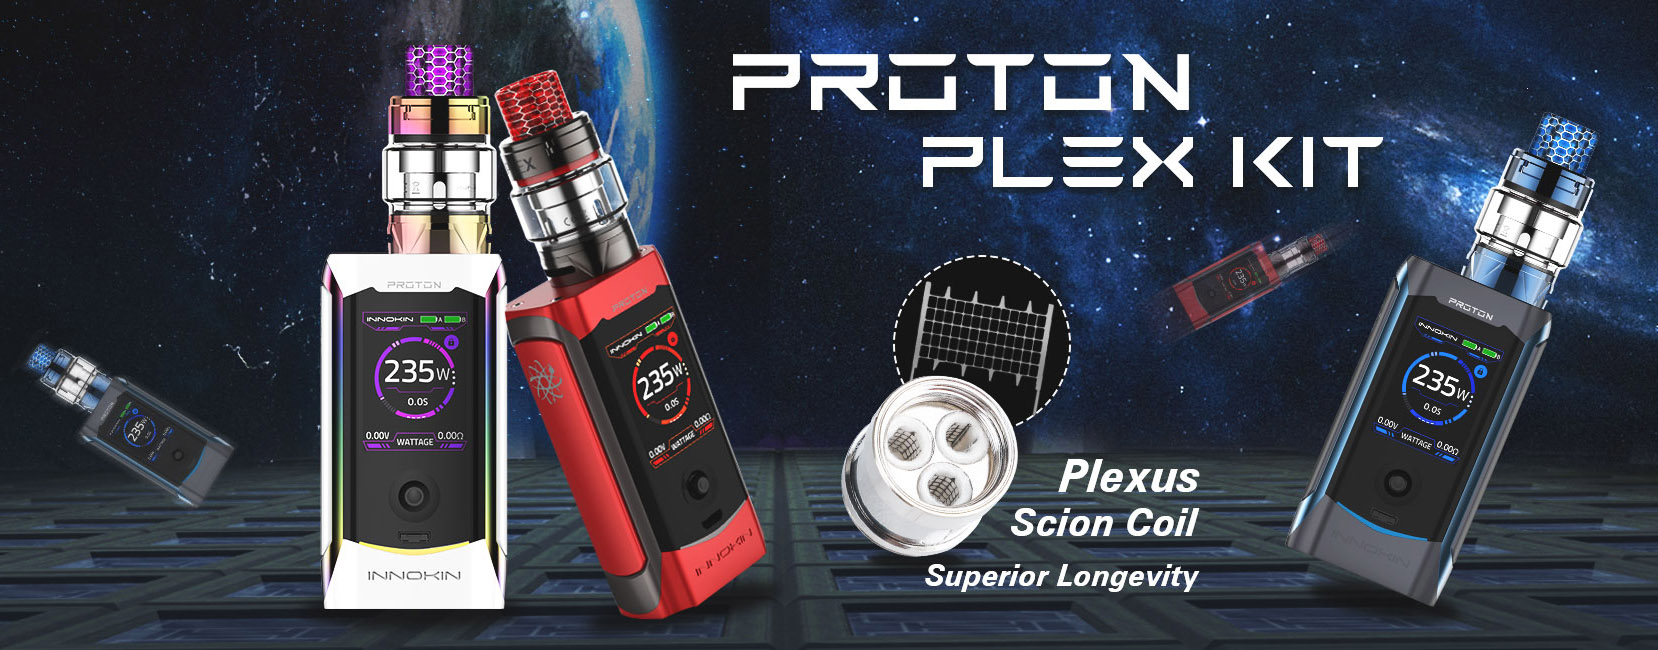 Proton_Plex_Kit-1.jpg